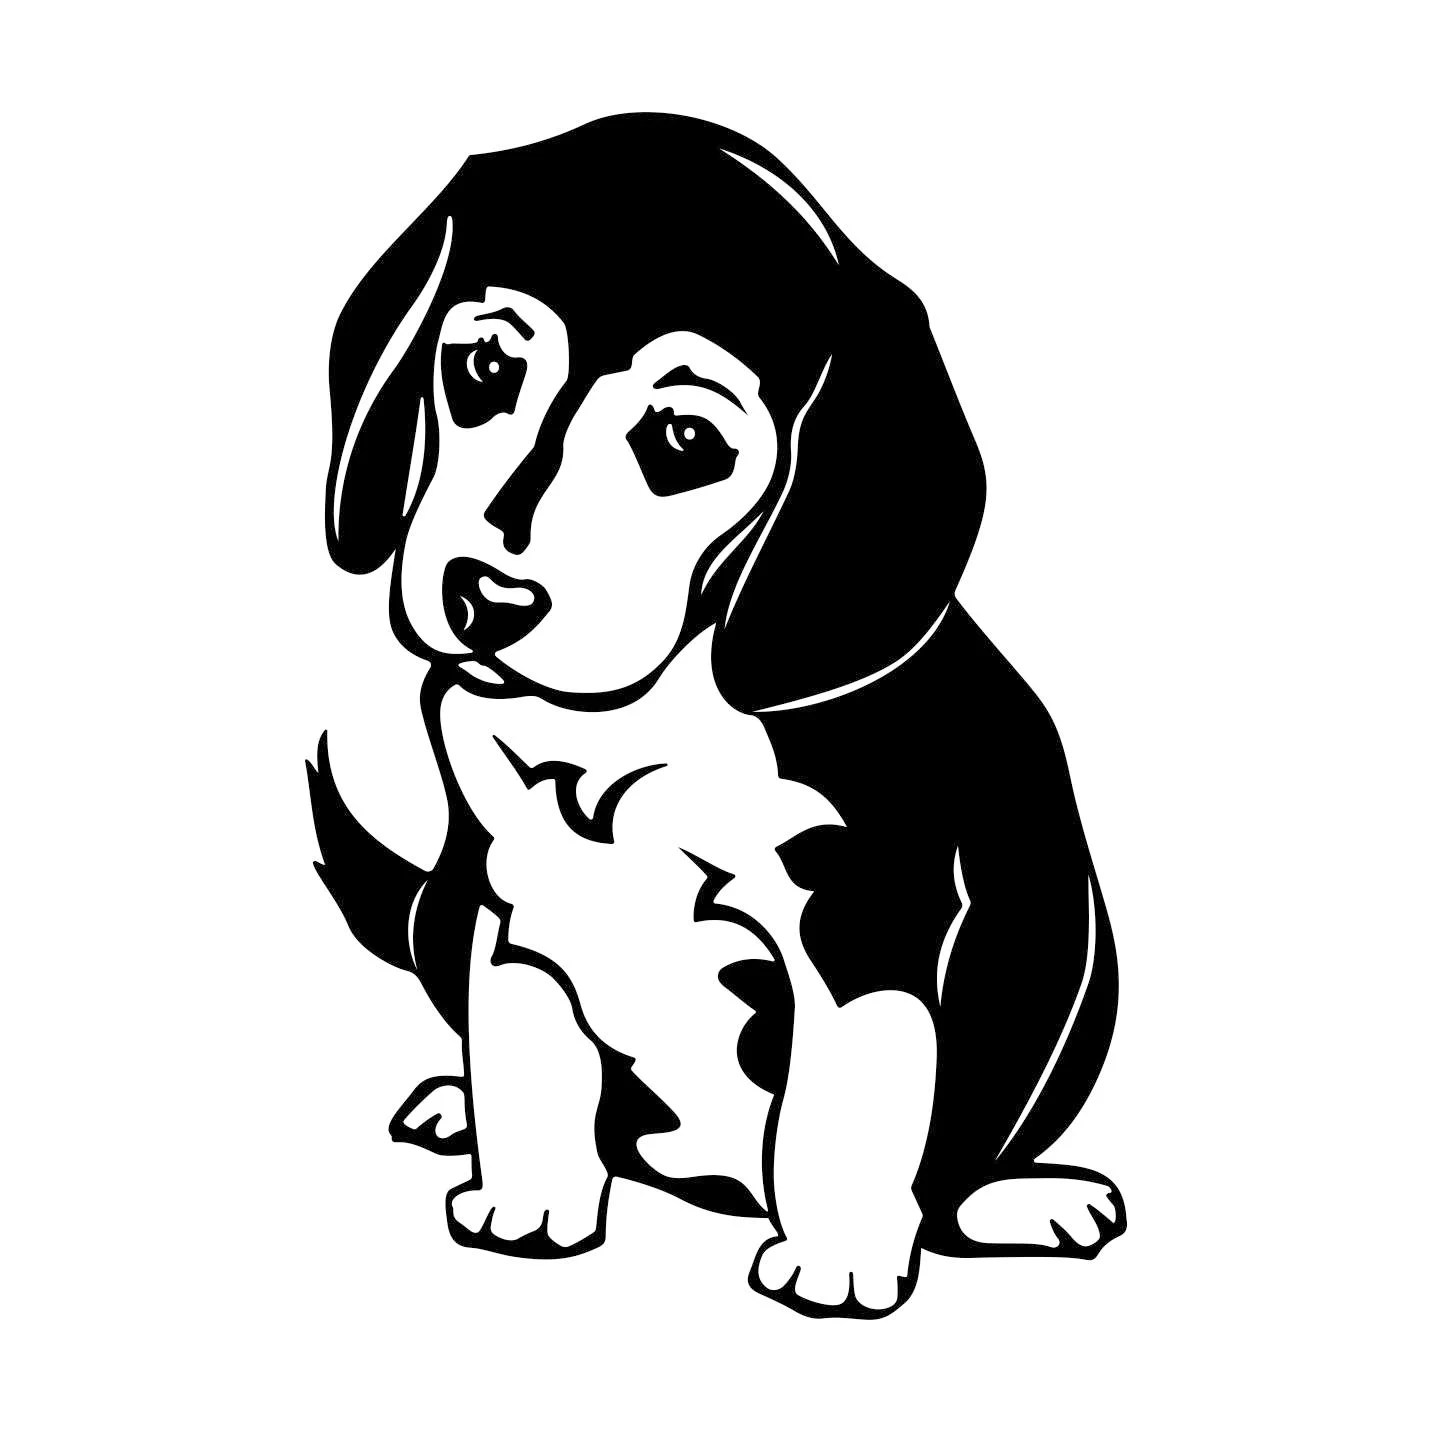 Beagle Dog Graphics Svg Dxf Eps Cdr Ai Vector Art